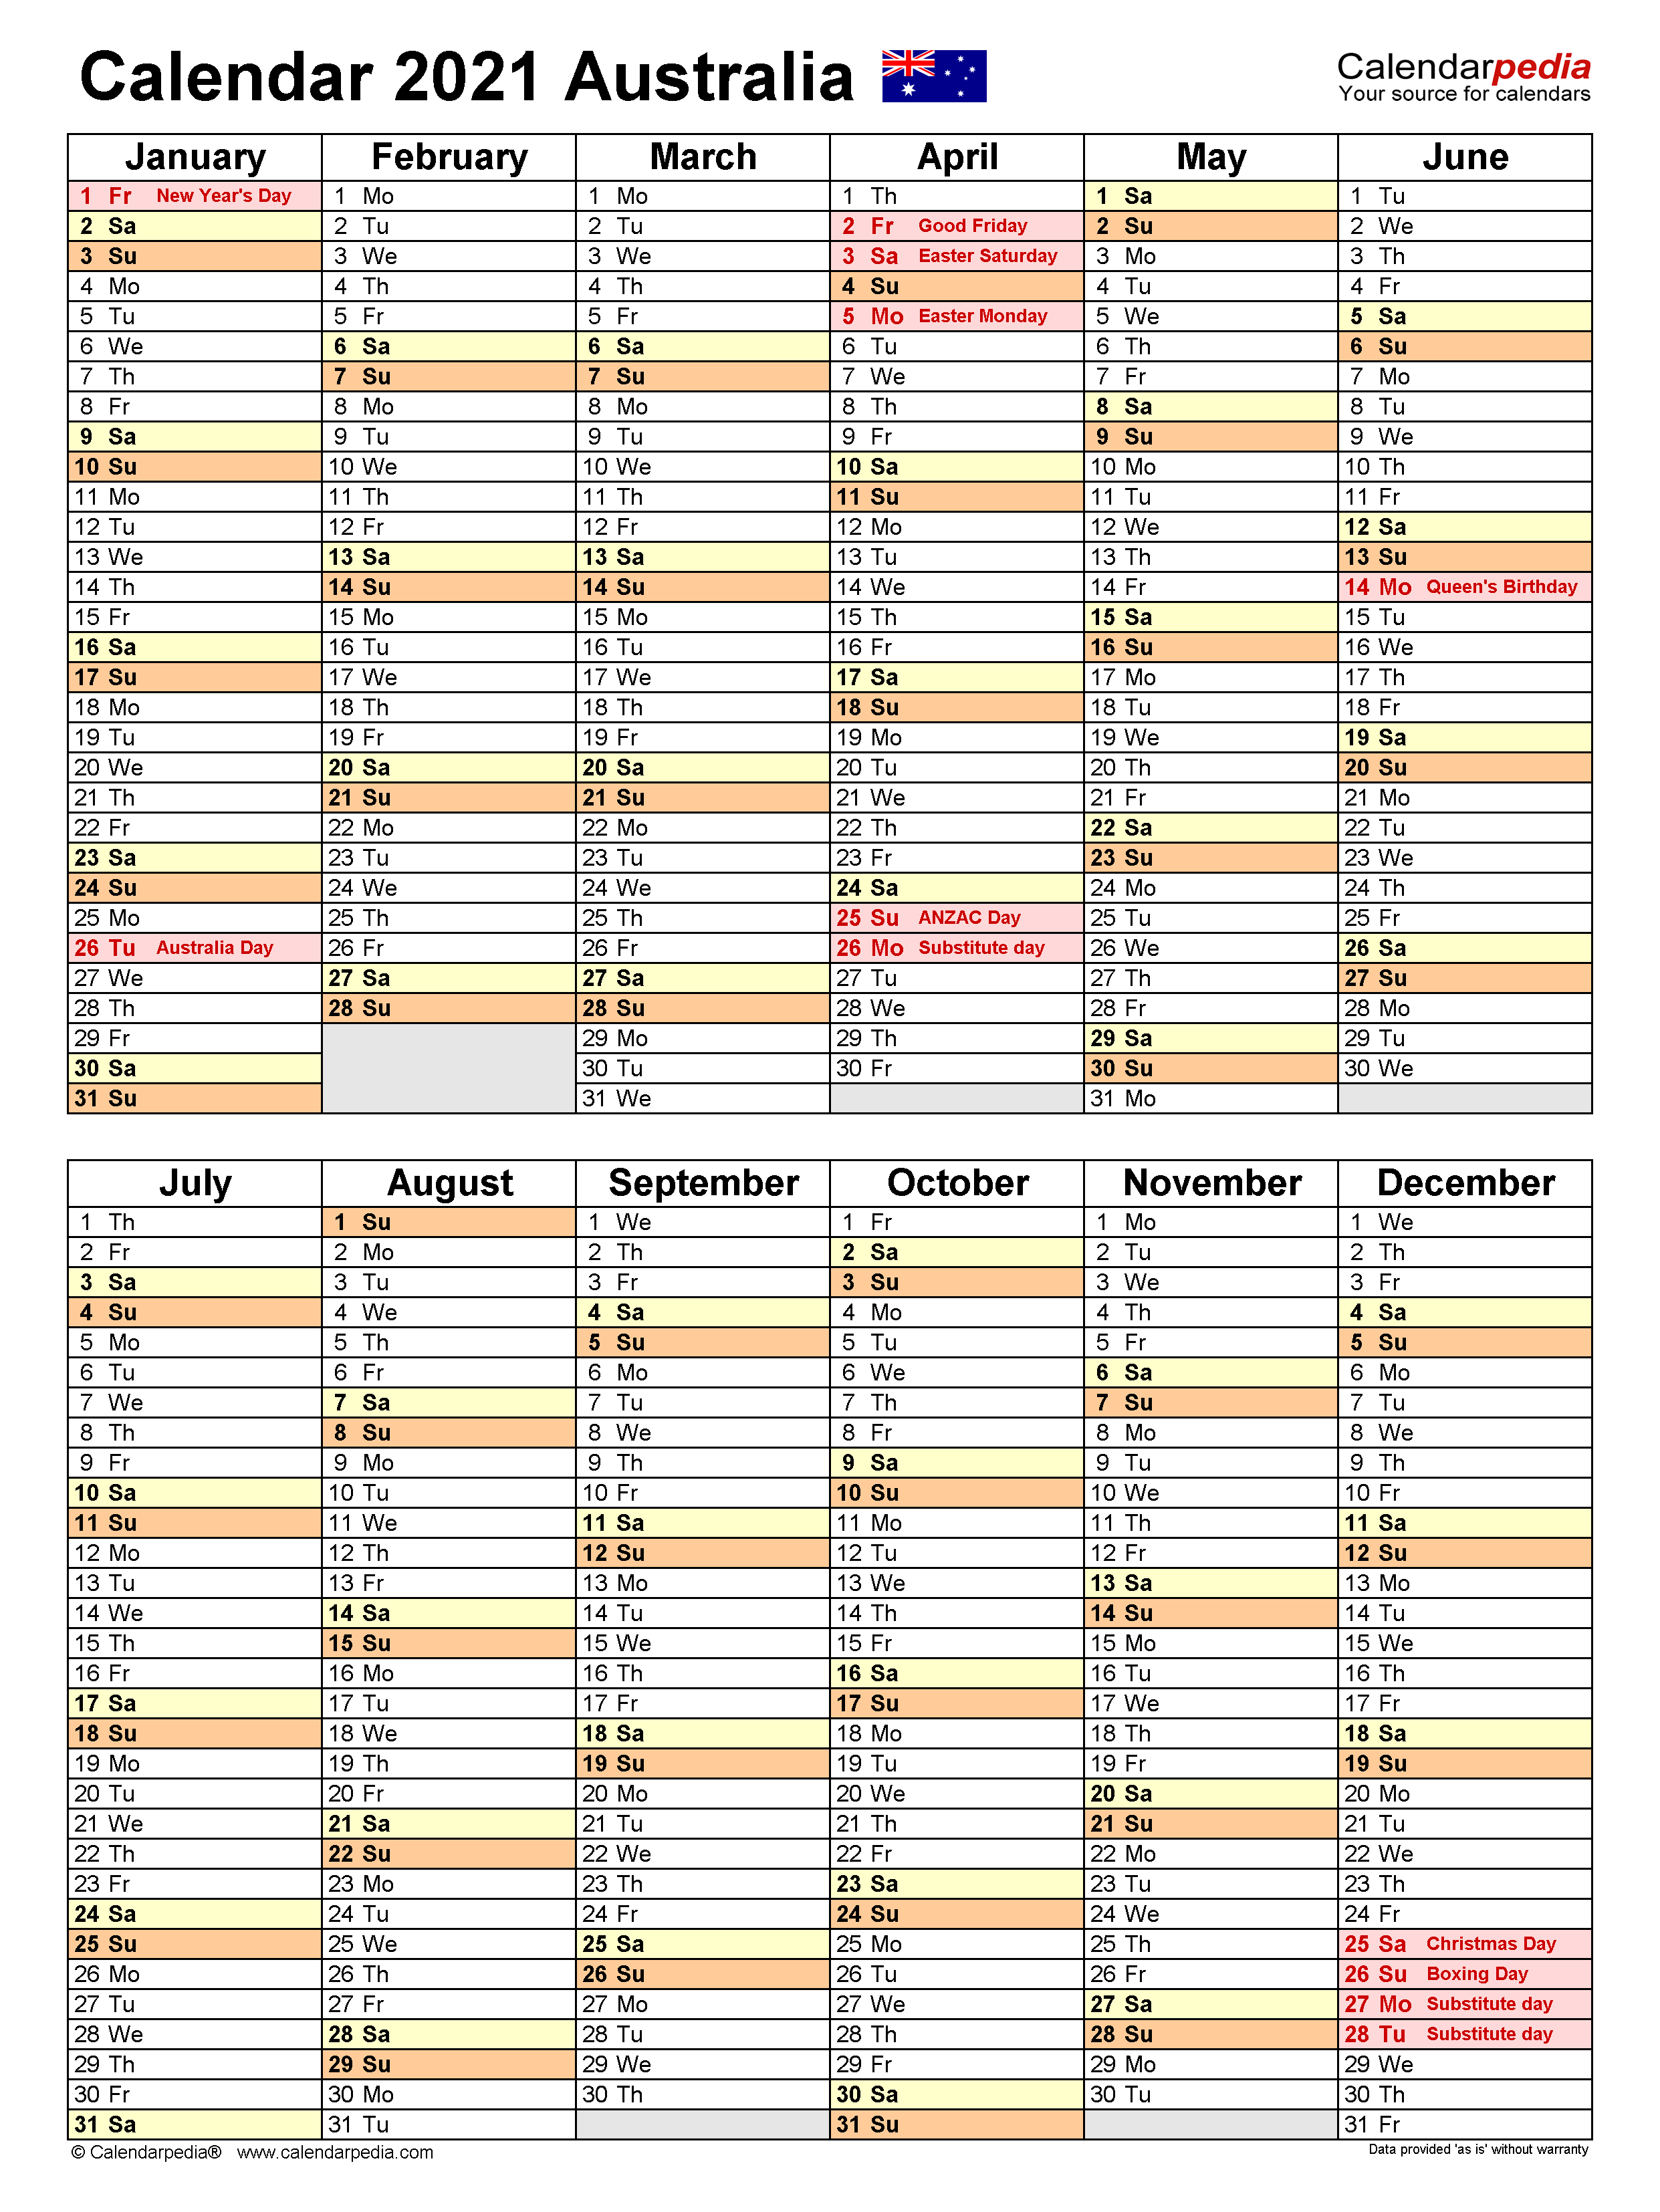 Australia Calendar 2021 – Free Printable Word Templates For Word Of The Day Calendar 2021